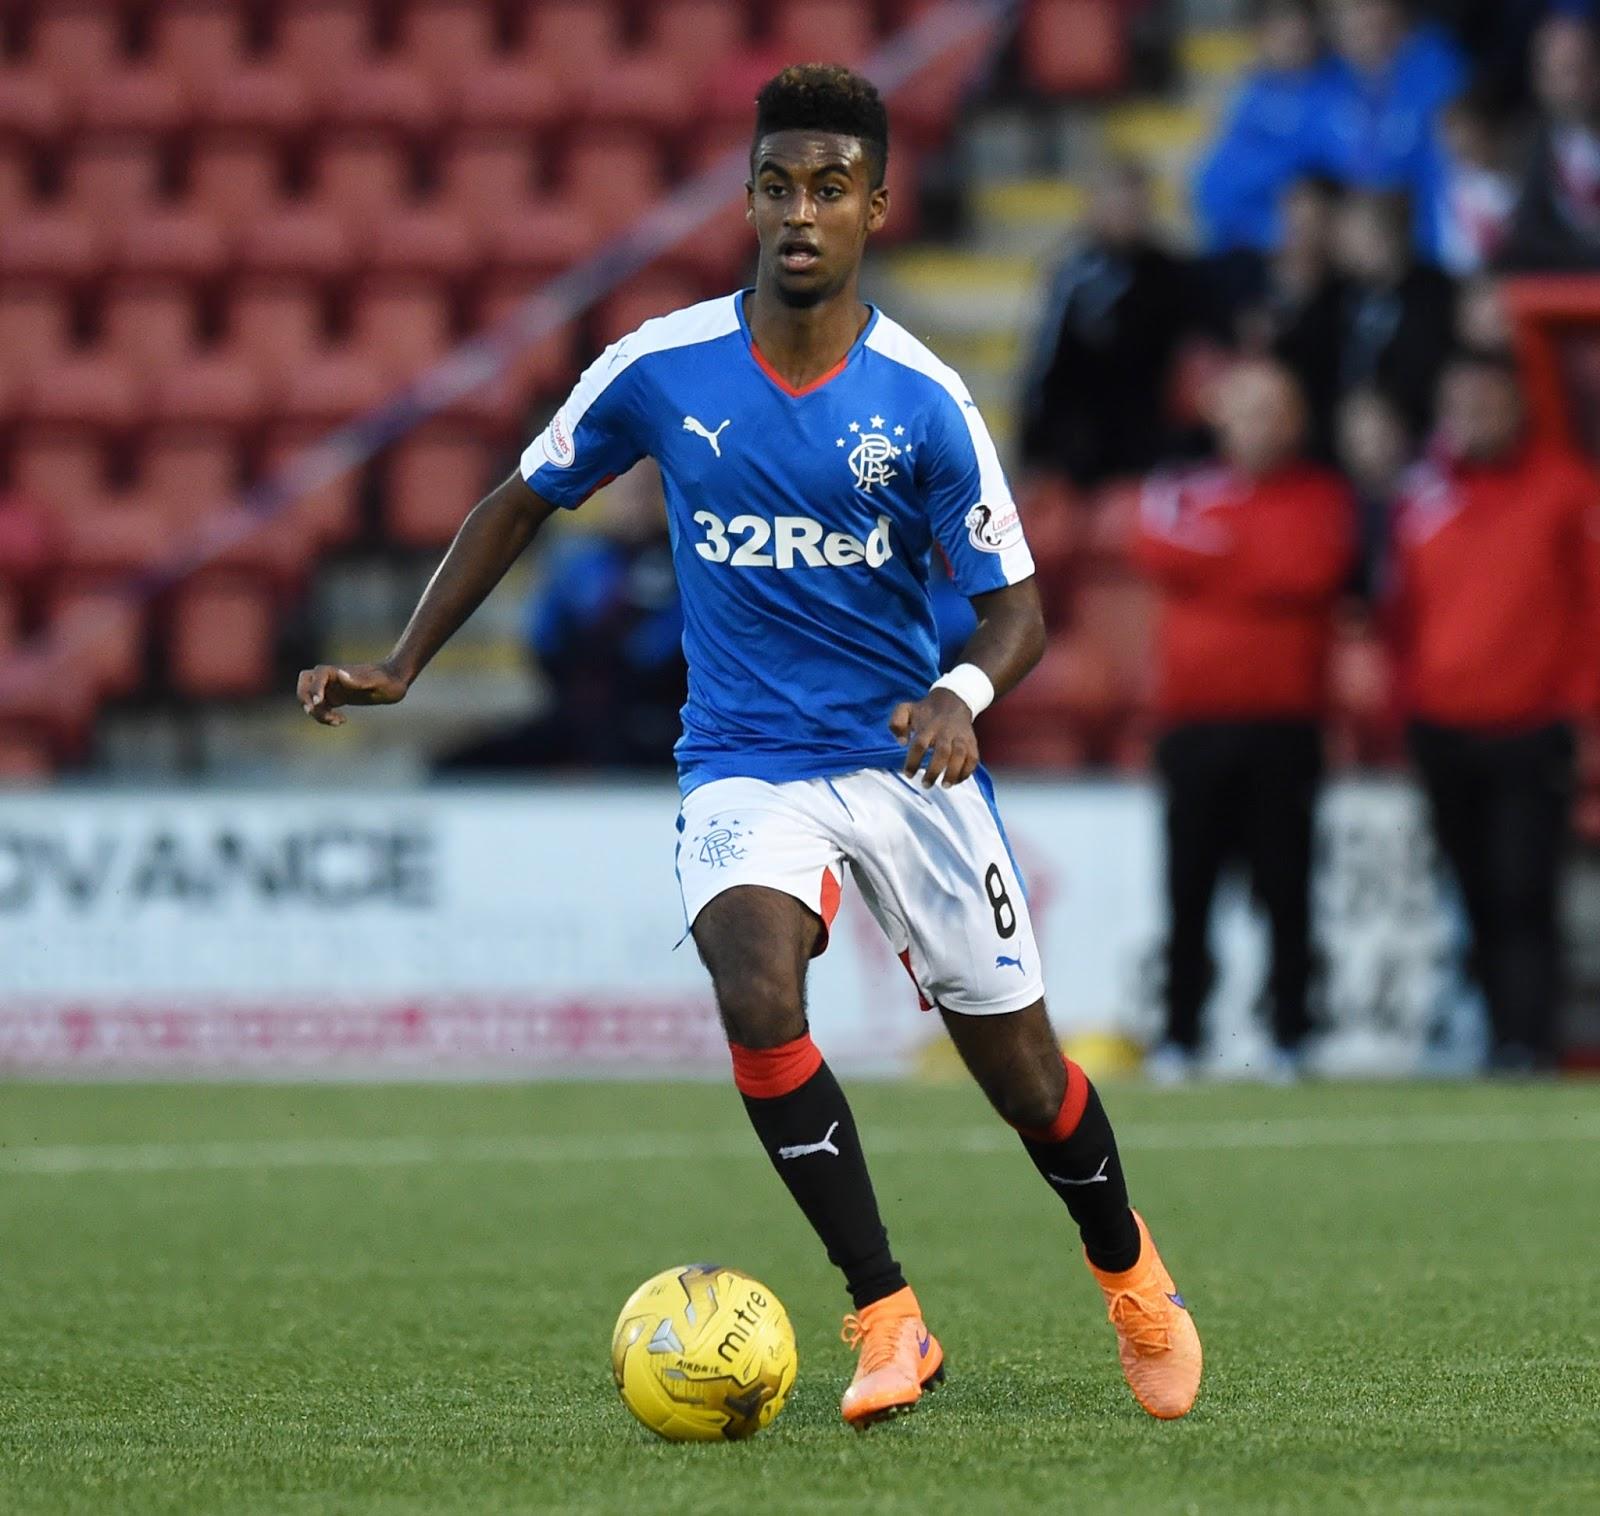 Arsenal's Gedion Zelalem at Ibrox – half season report